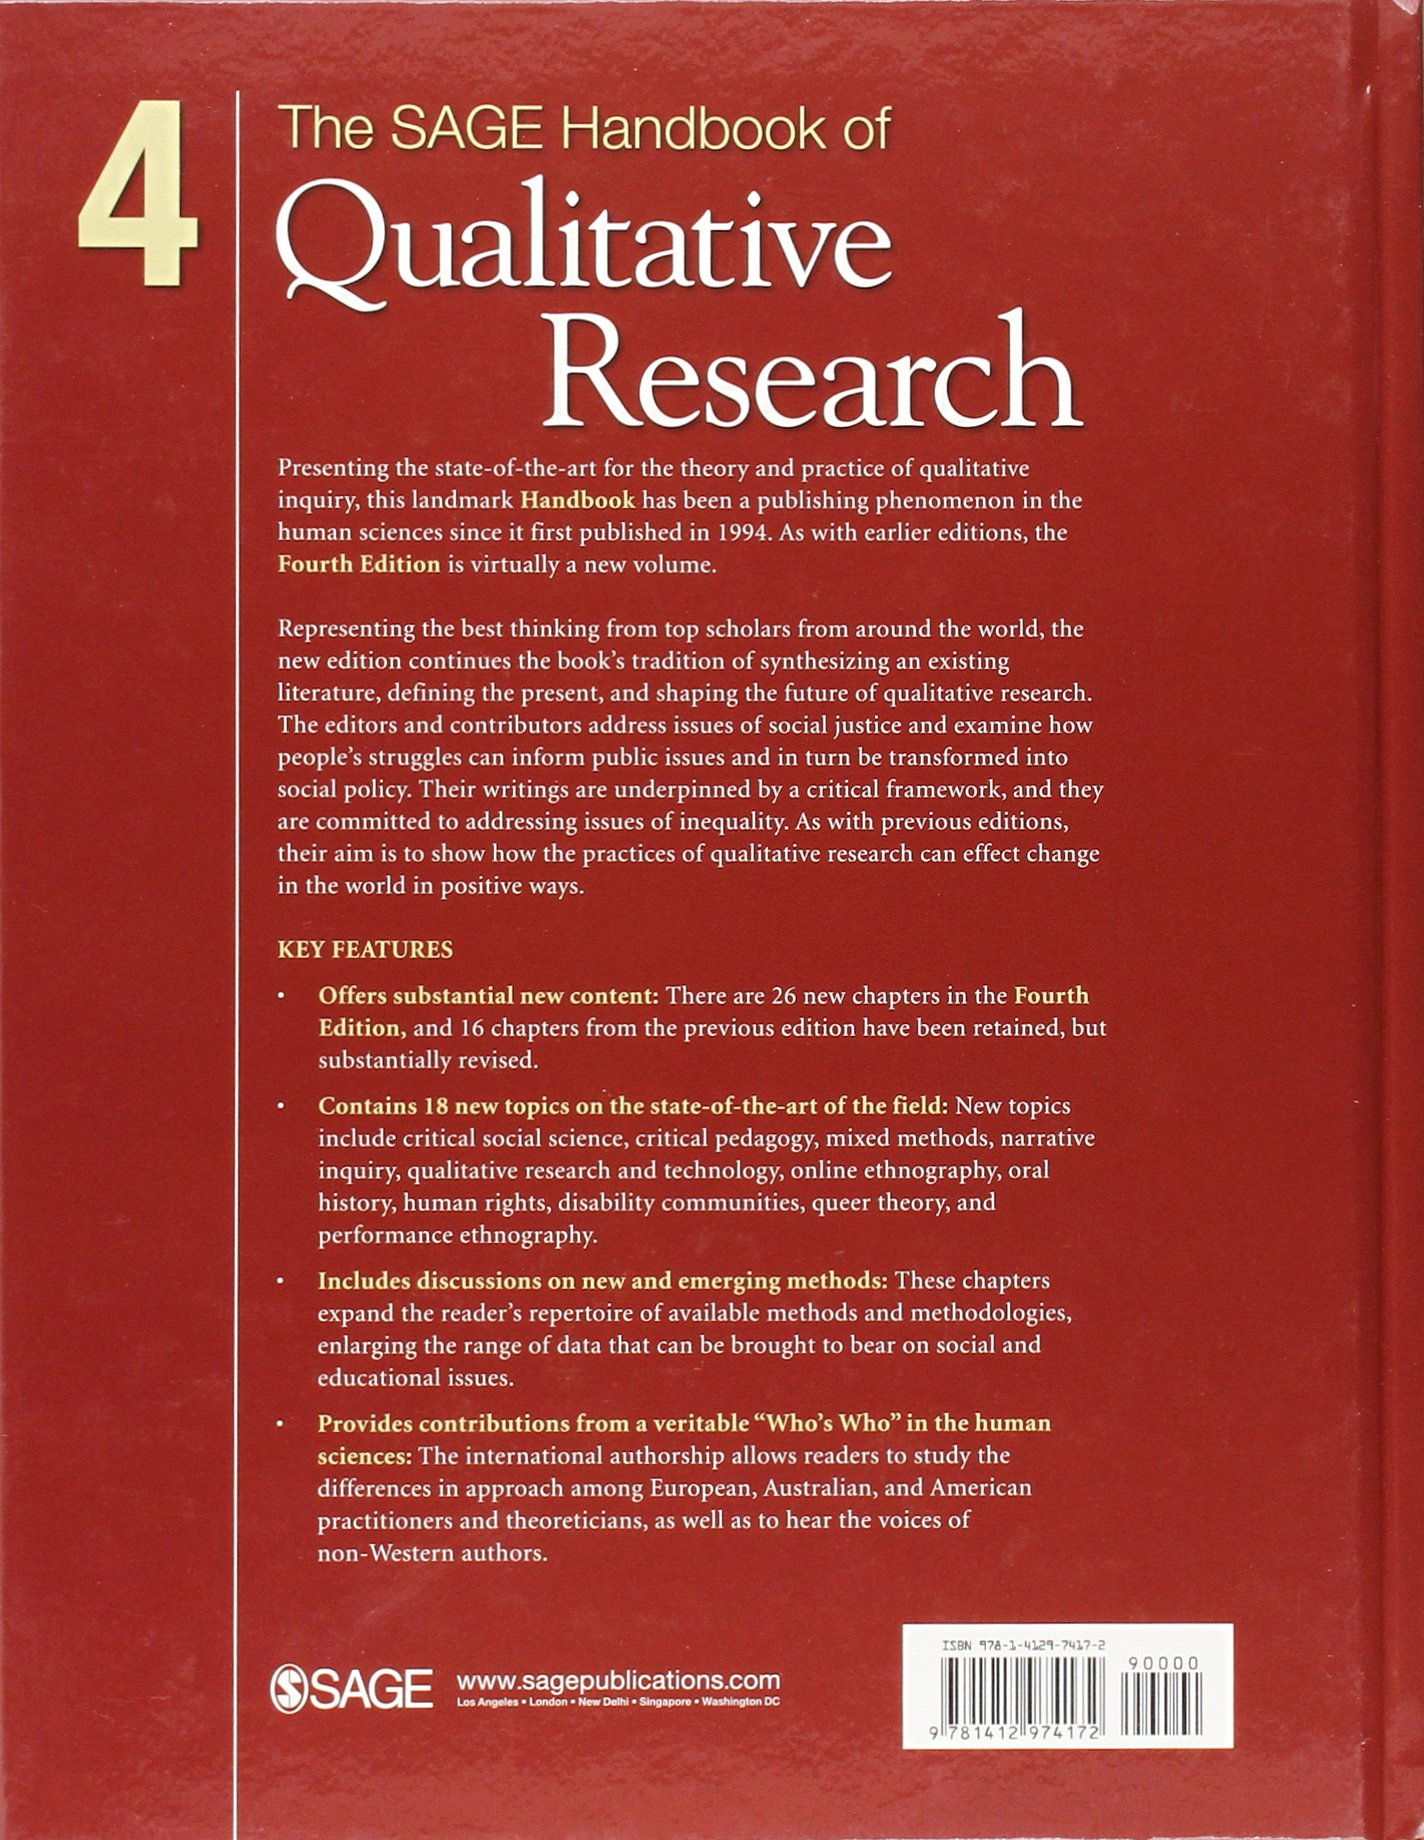 The sage handbook of qualitative research norman denzin yvonna the sage handbook of qualitative research norman denzin yvonna lincoln 9781412974172 books amazon buycottarizona